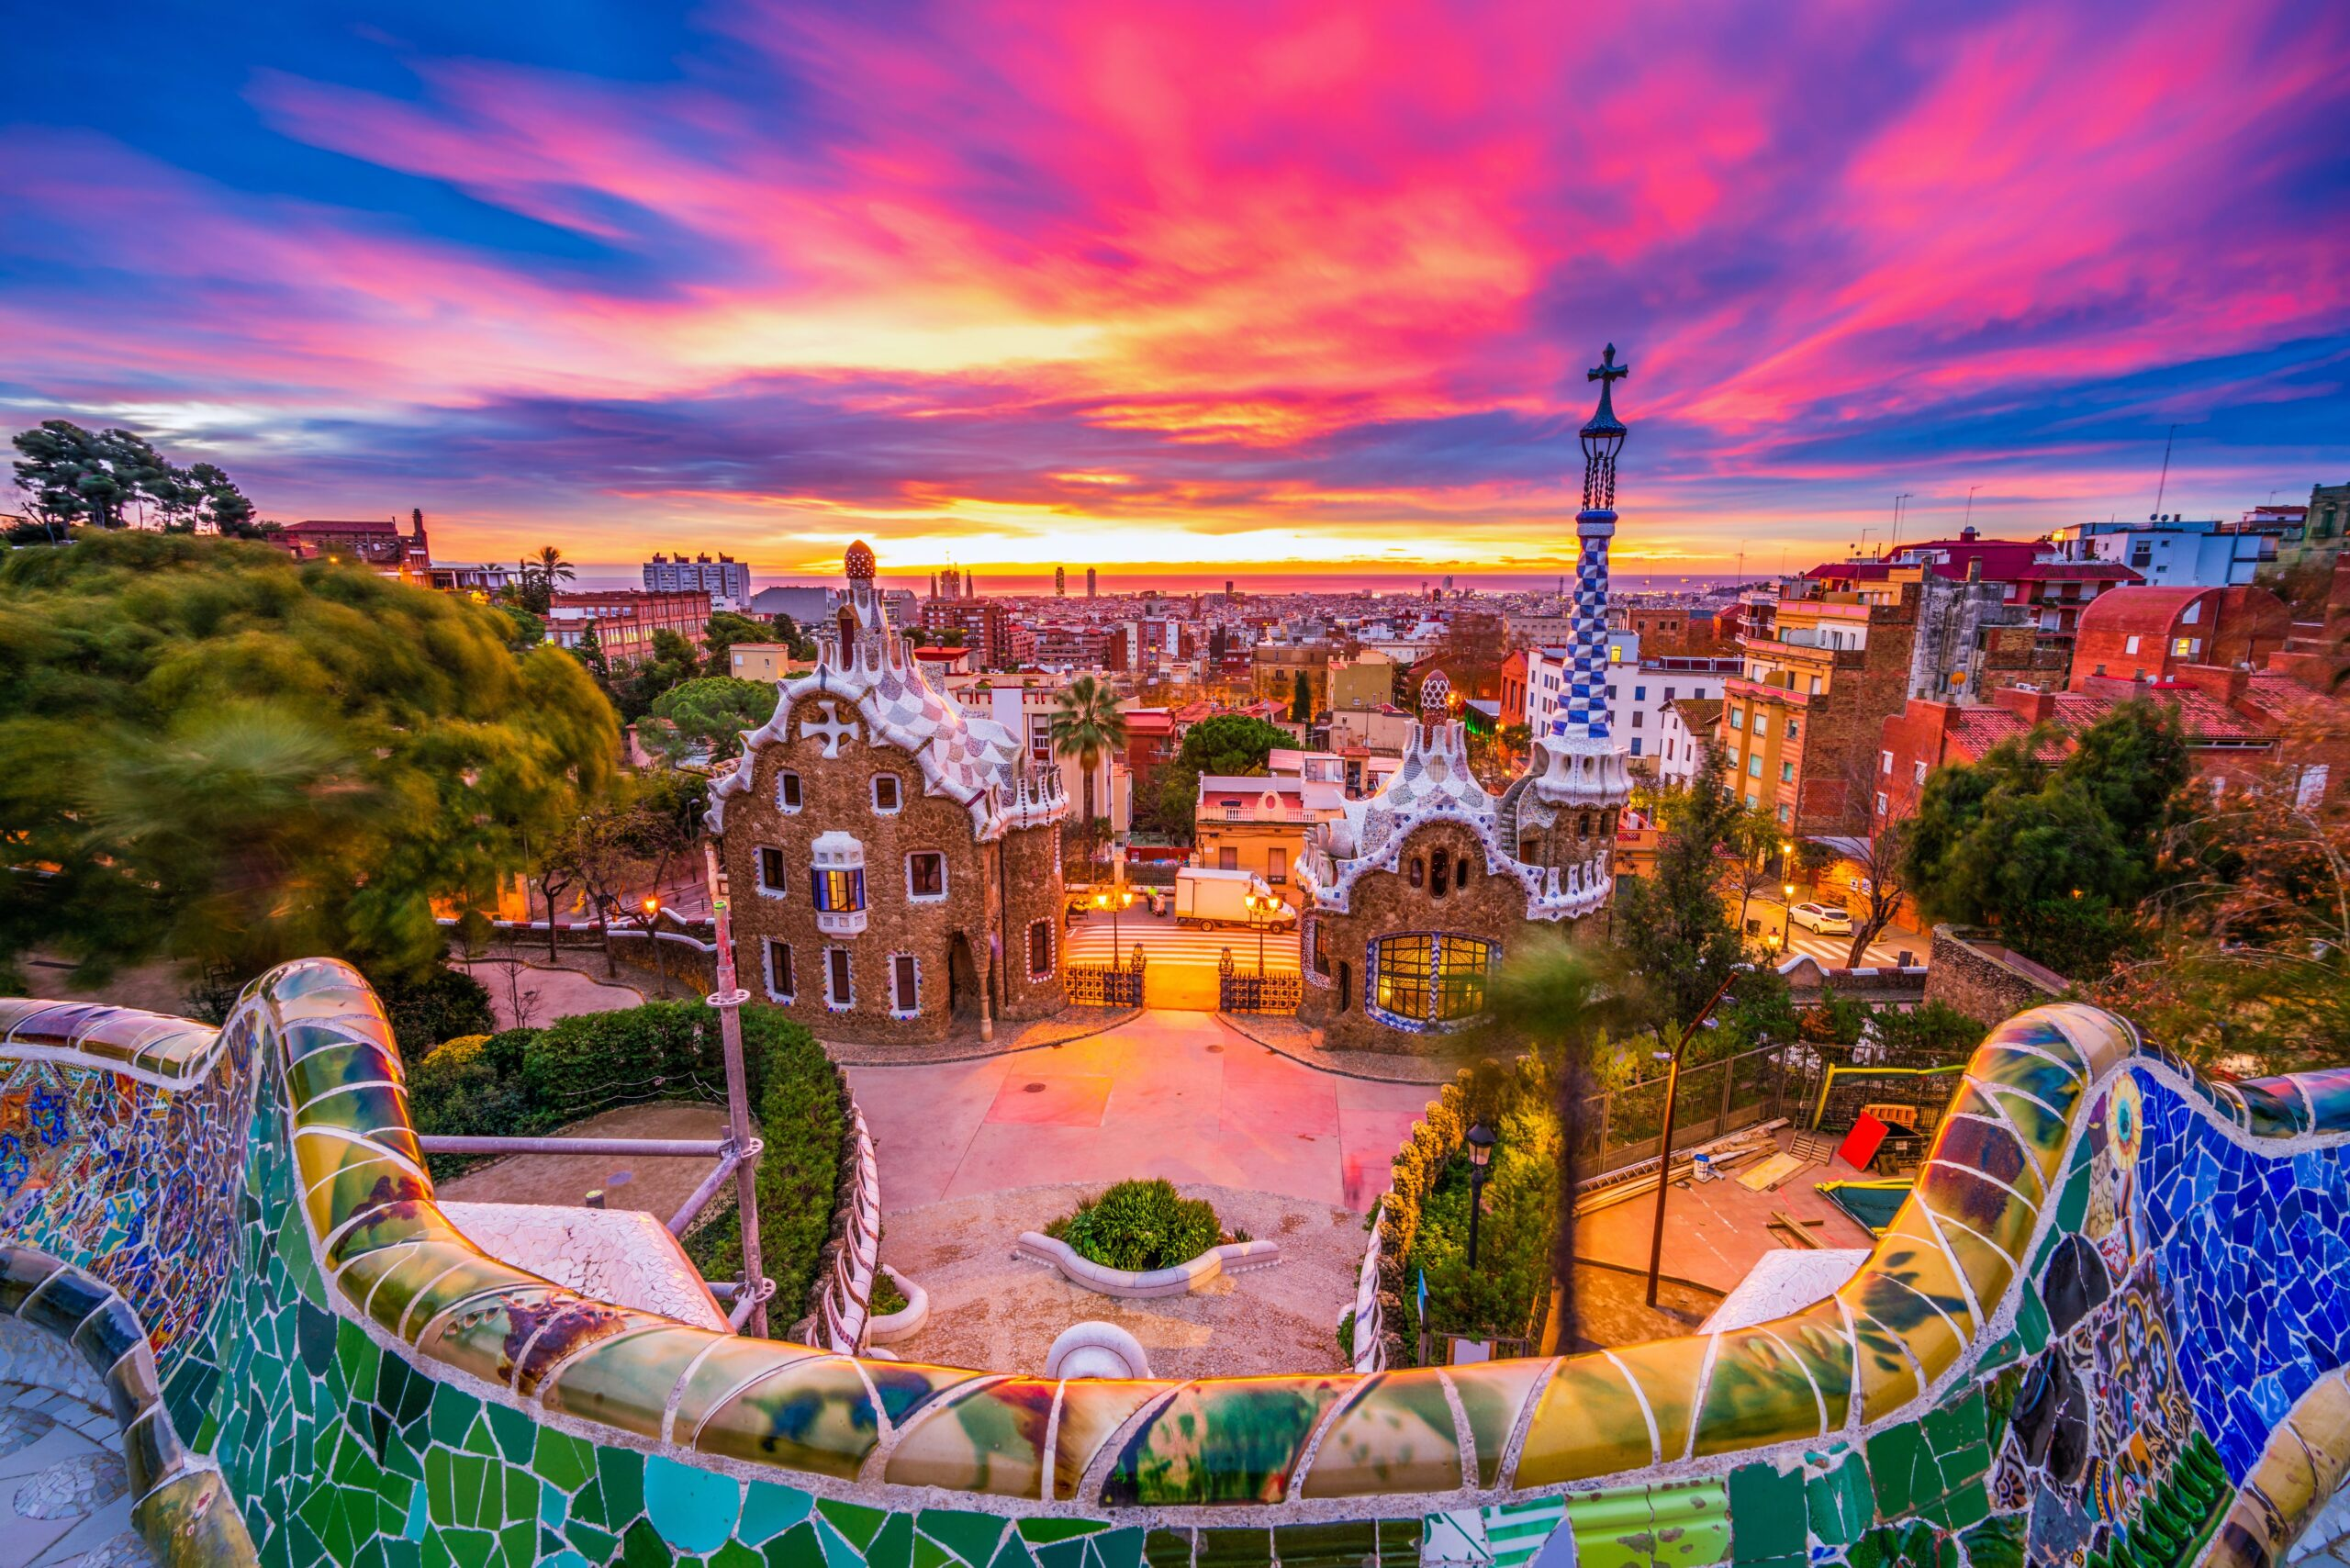 Beautiful sunrise in BarcelonaBeautiful sunrise in BarcelonaBeautiful sunrise in Barcelona, Spain